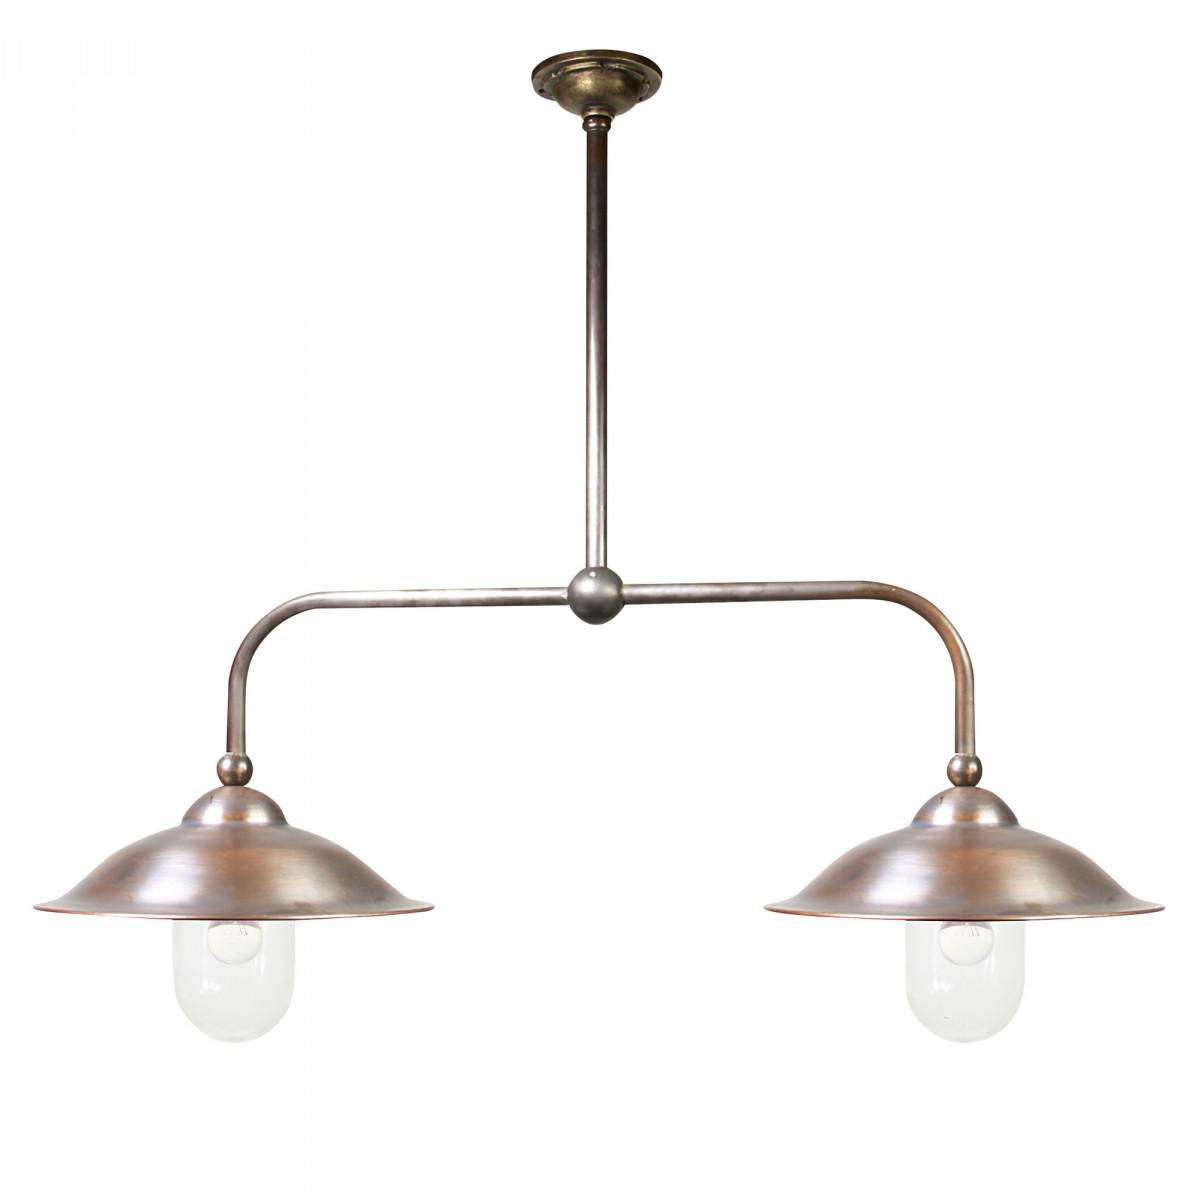 BuitenlampVienna 2-lichts 130cm